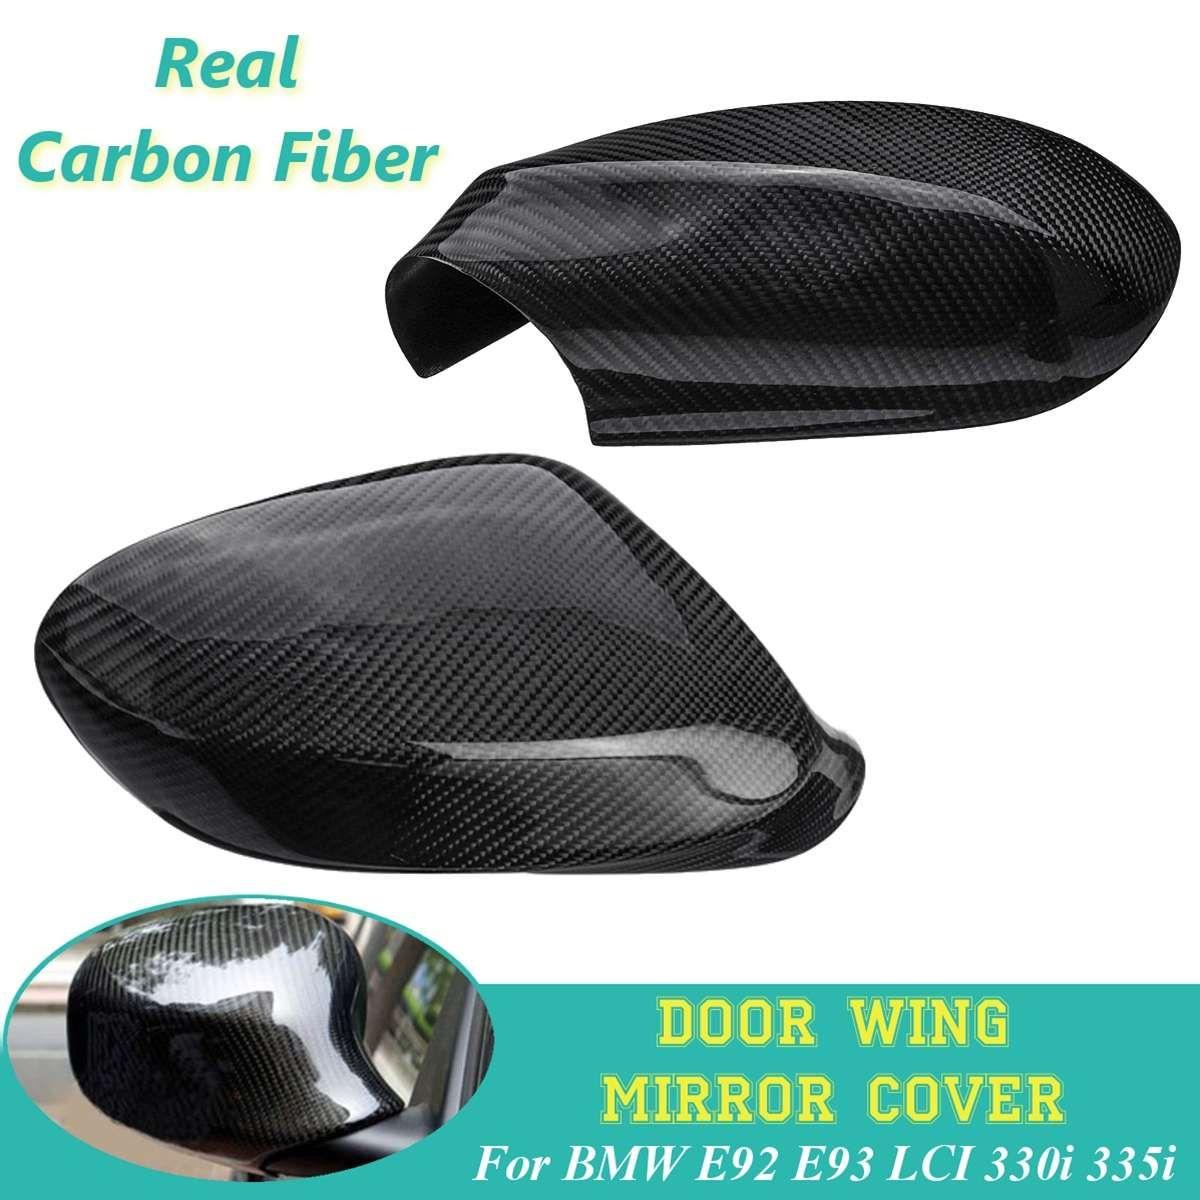 Mirror Cover Cap For BMW E92 E93 LCI 325i 328i 335i 2009 2010 2011 2012 Black Real Carbon Fiber Auto Car Rearview Side Wing